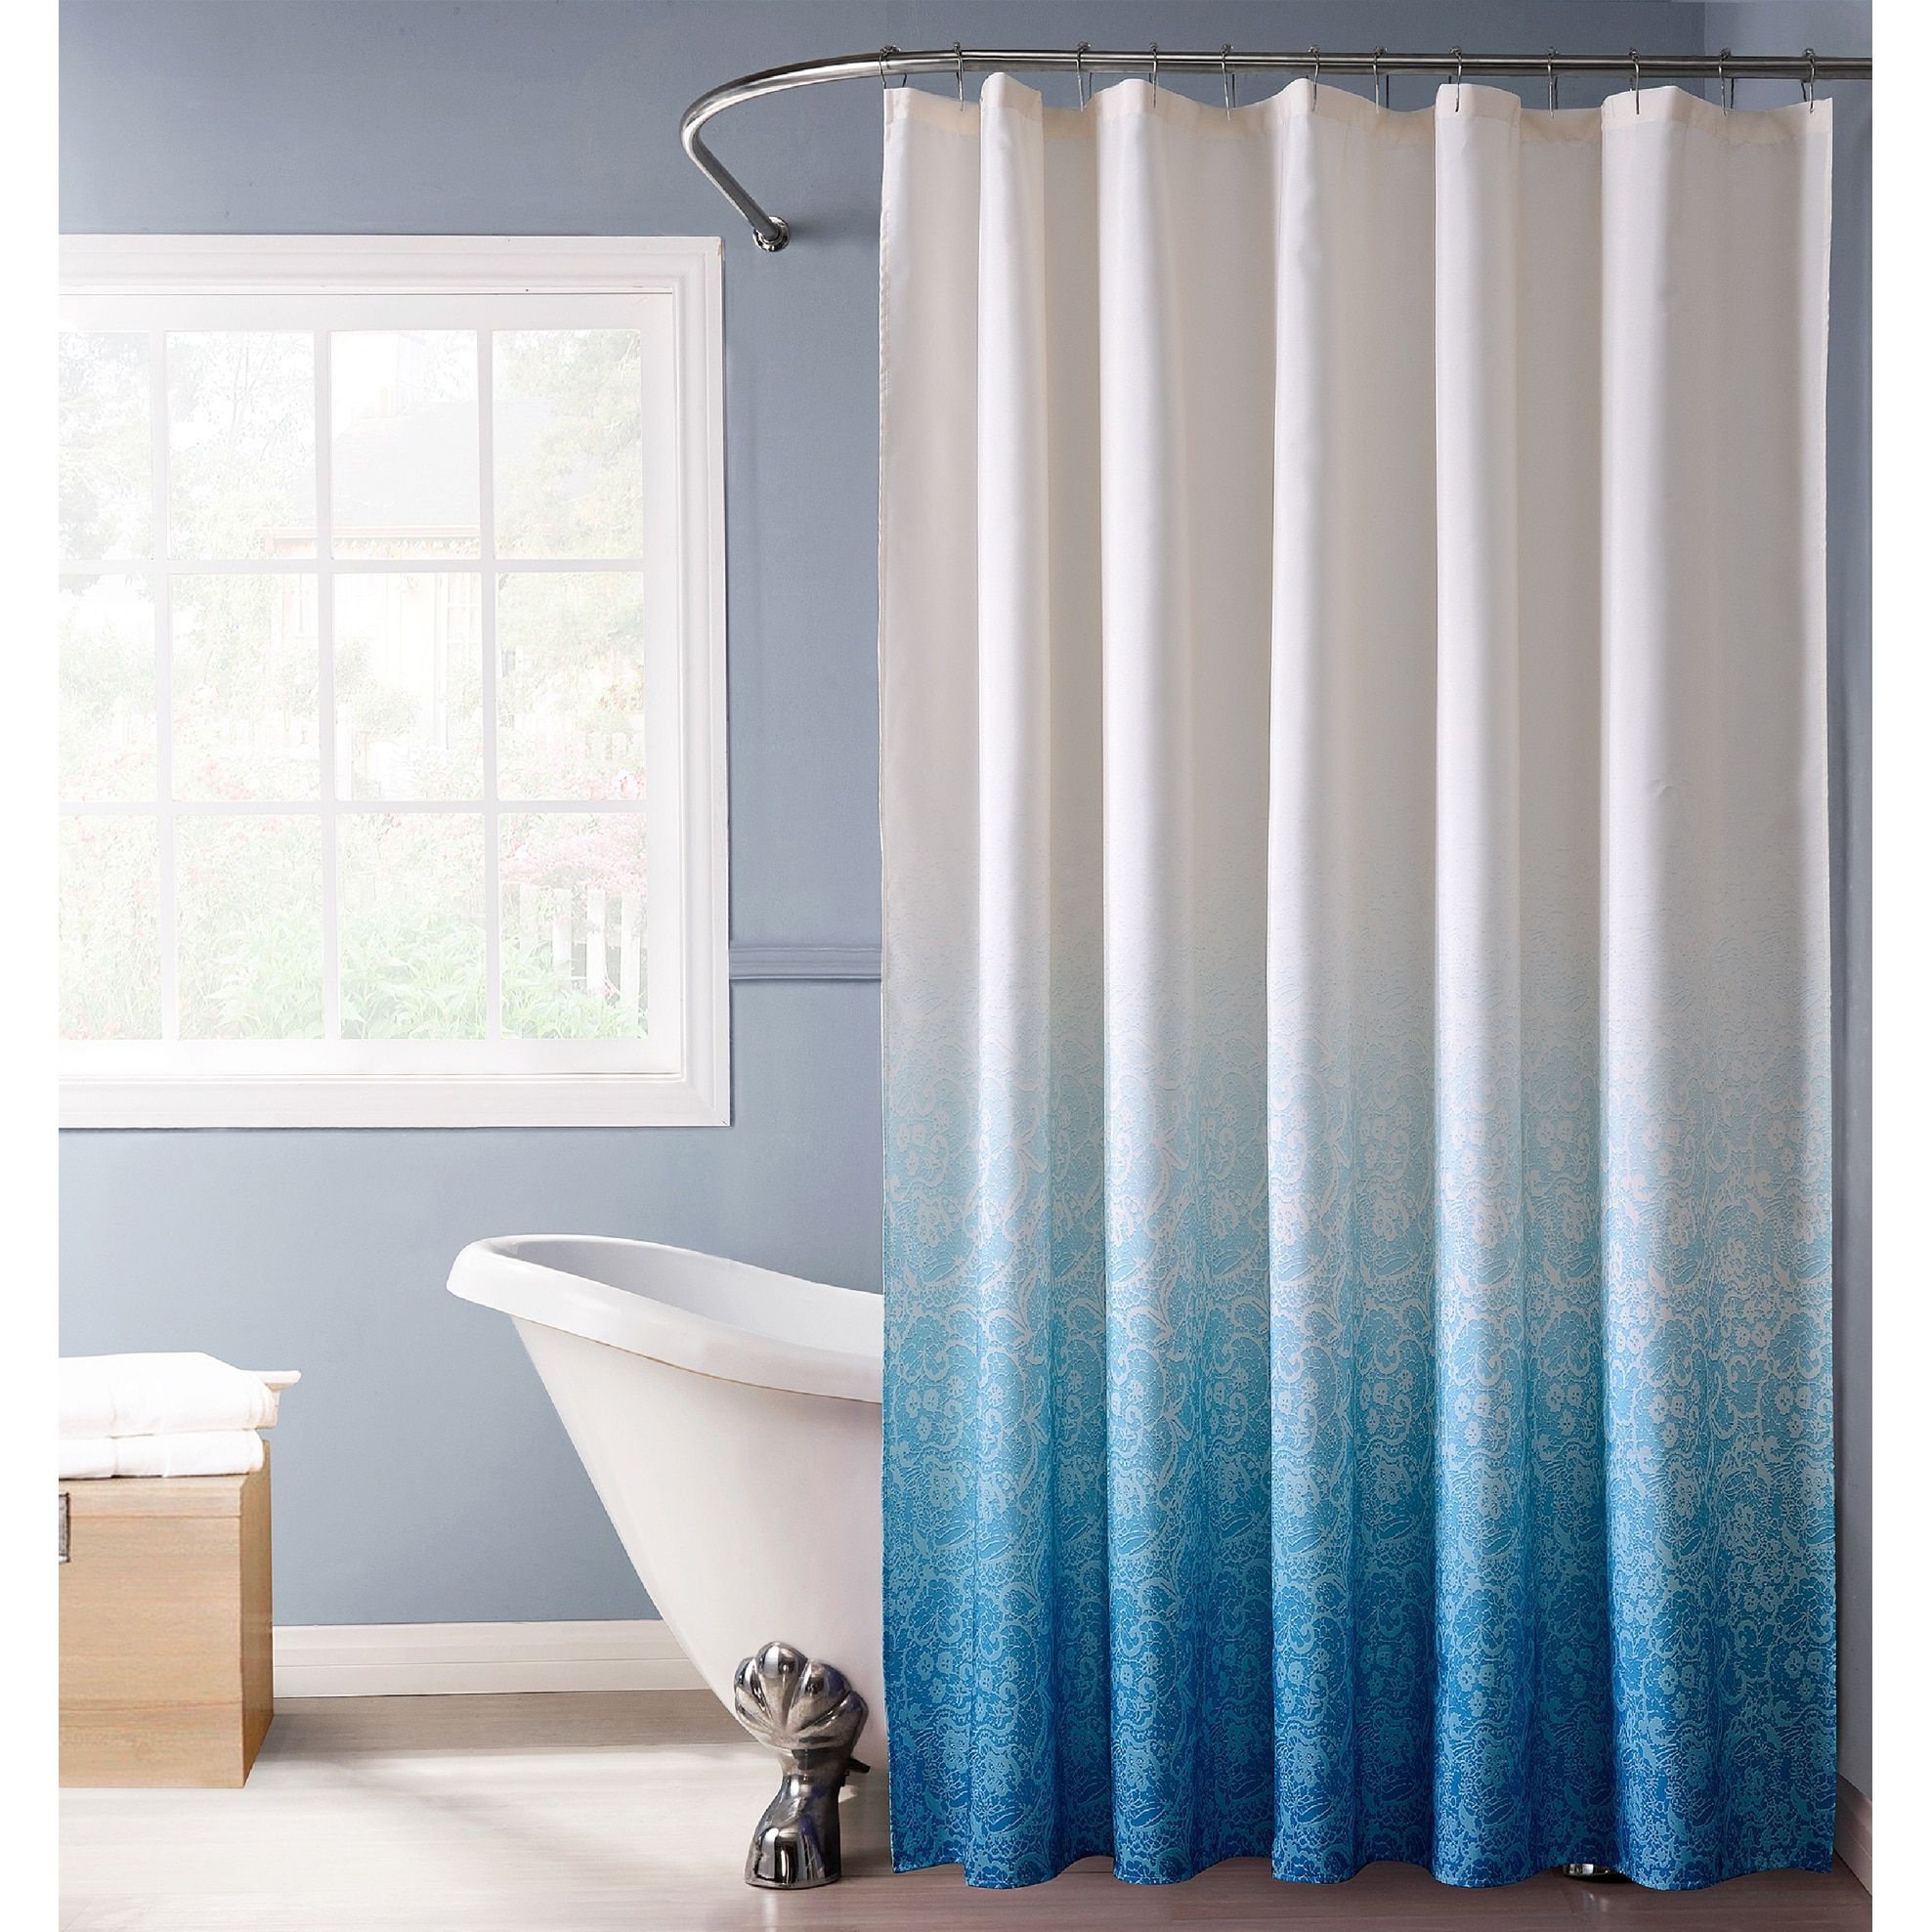 Shop lace ombre shower curtain showercurtain bathroom interior